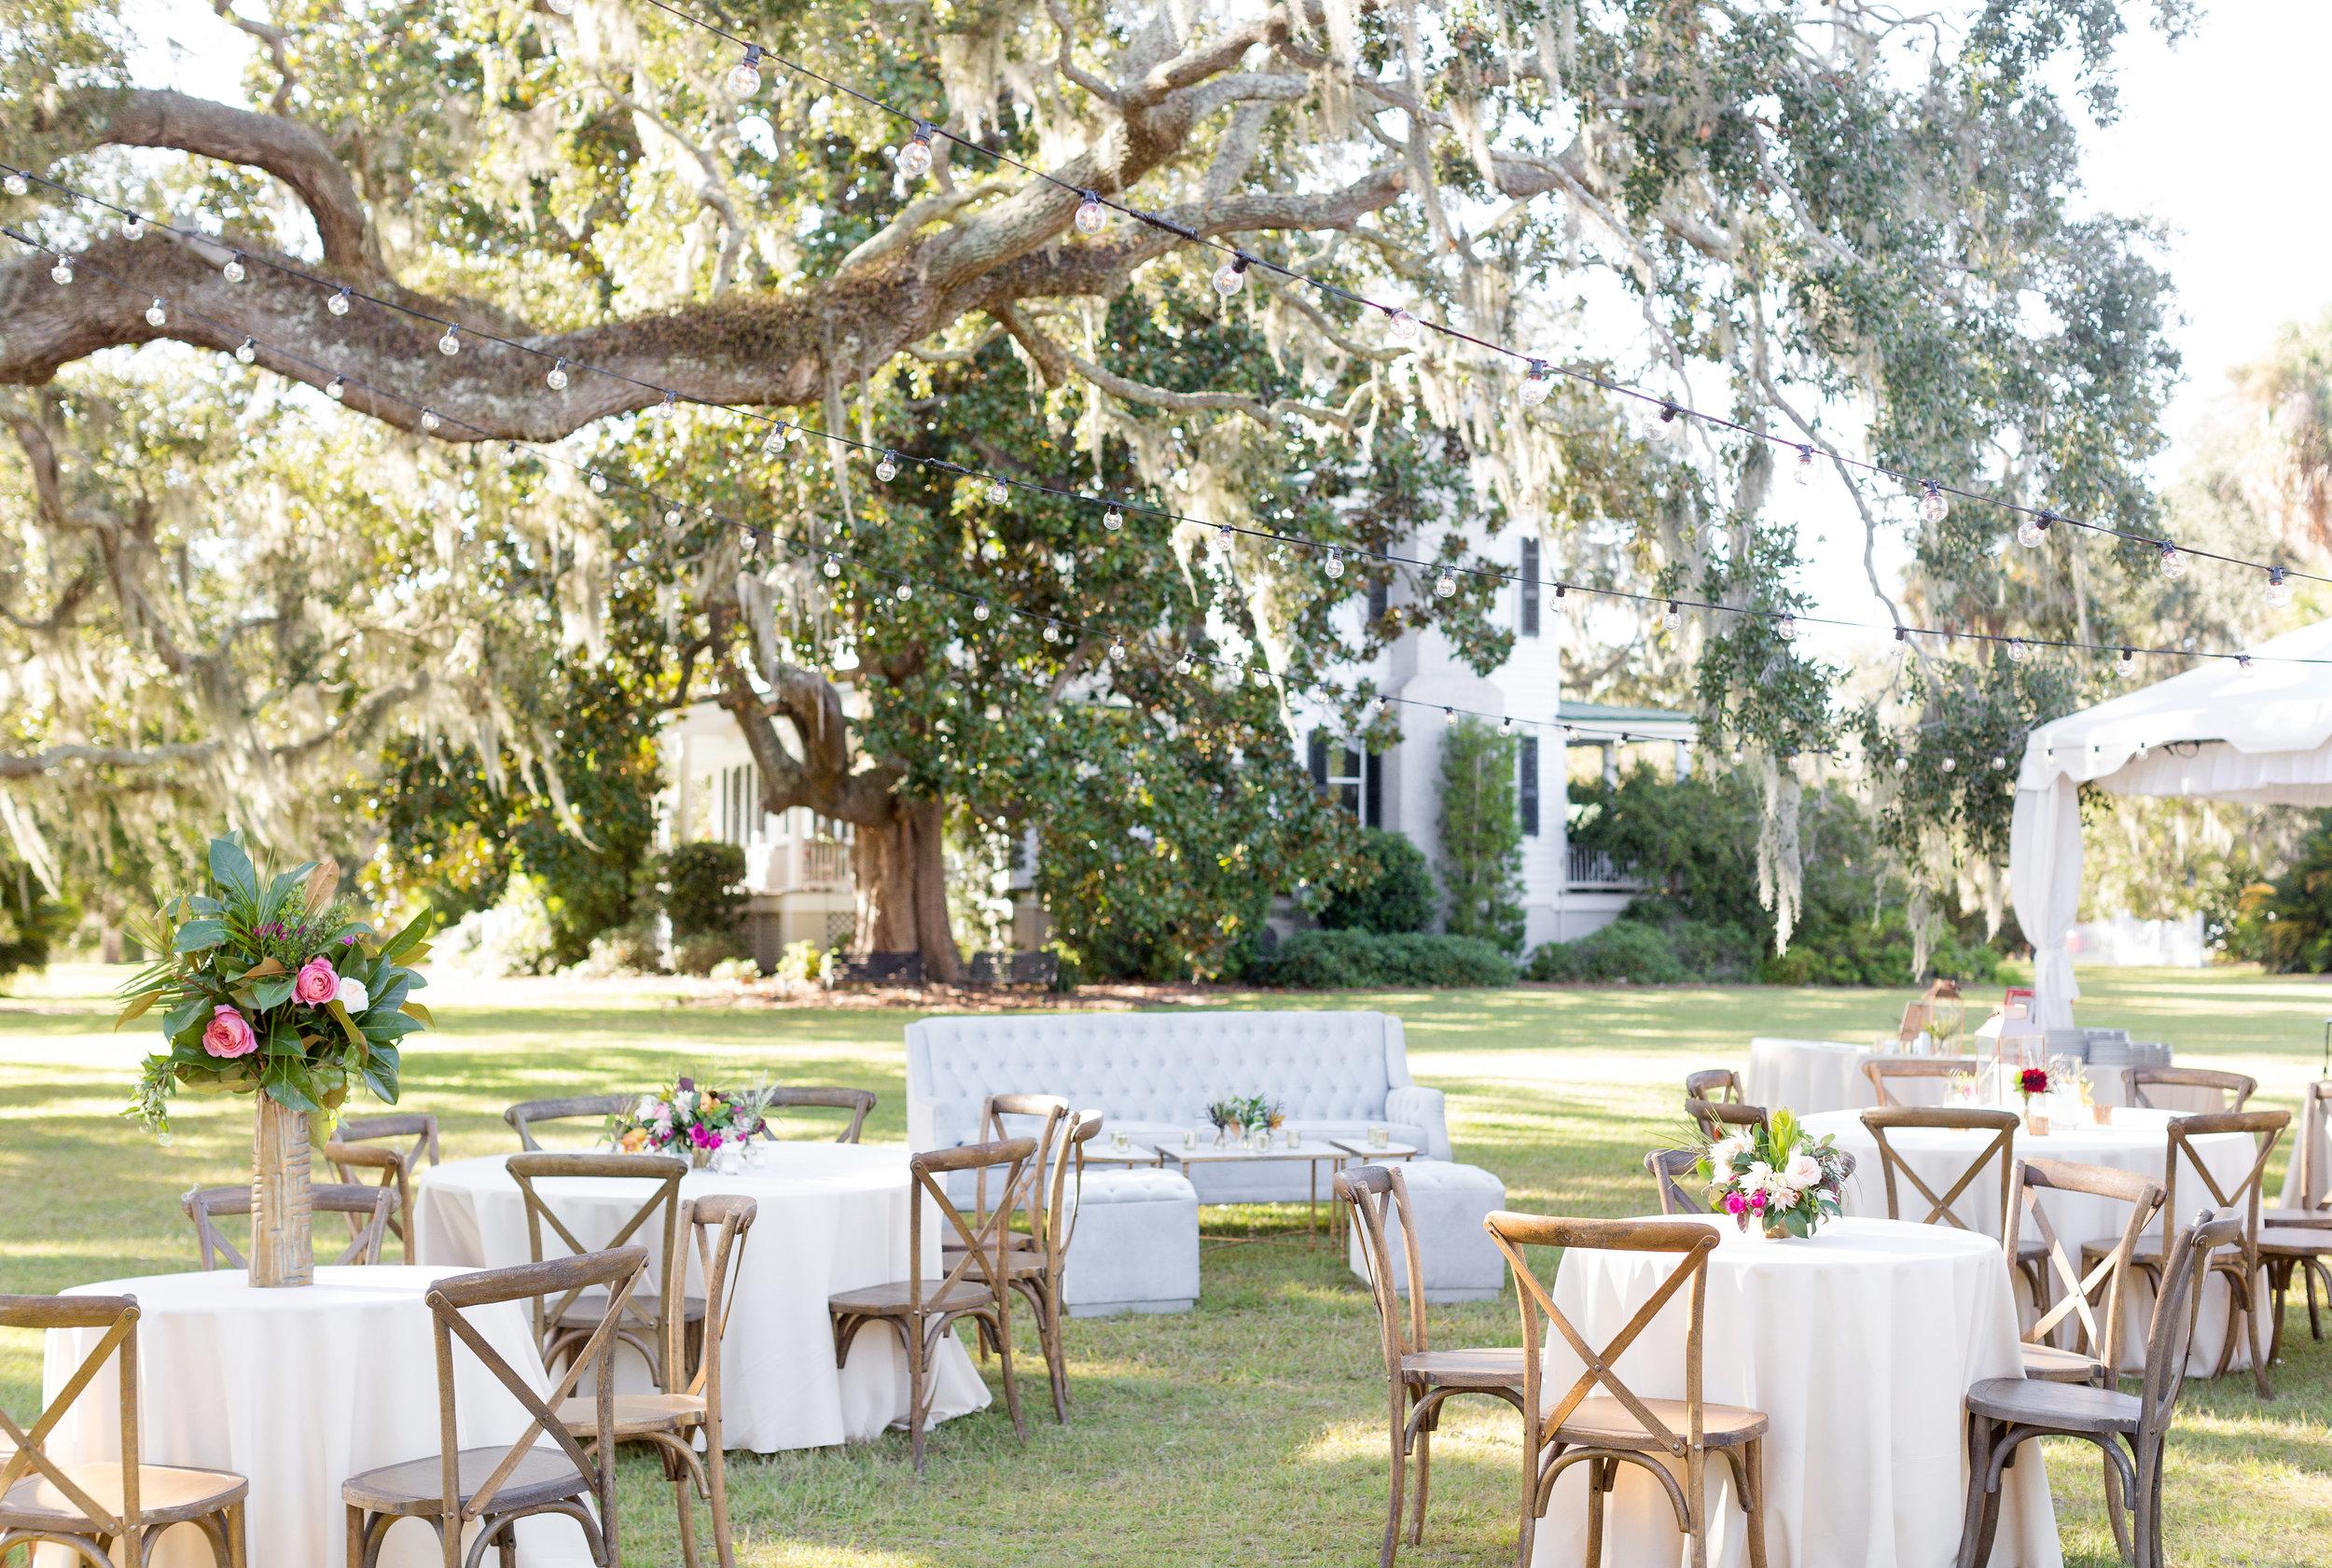 Carrie + Douglas: Dream Edisto Island Wedding at Cypress Tree Plantation | Palmetto State Weddings